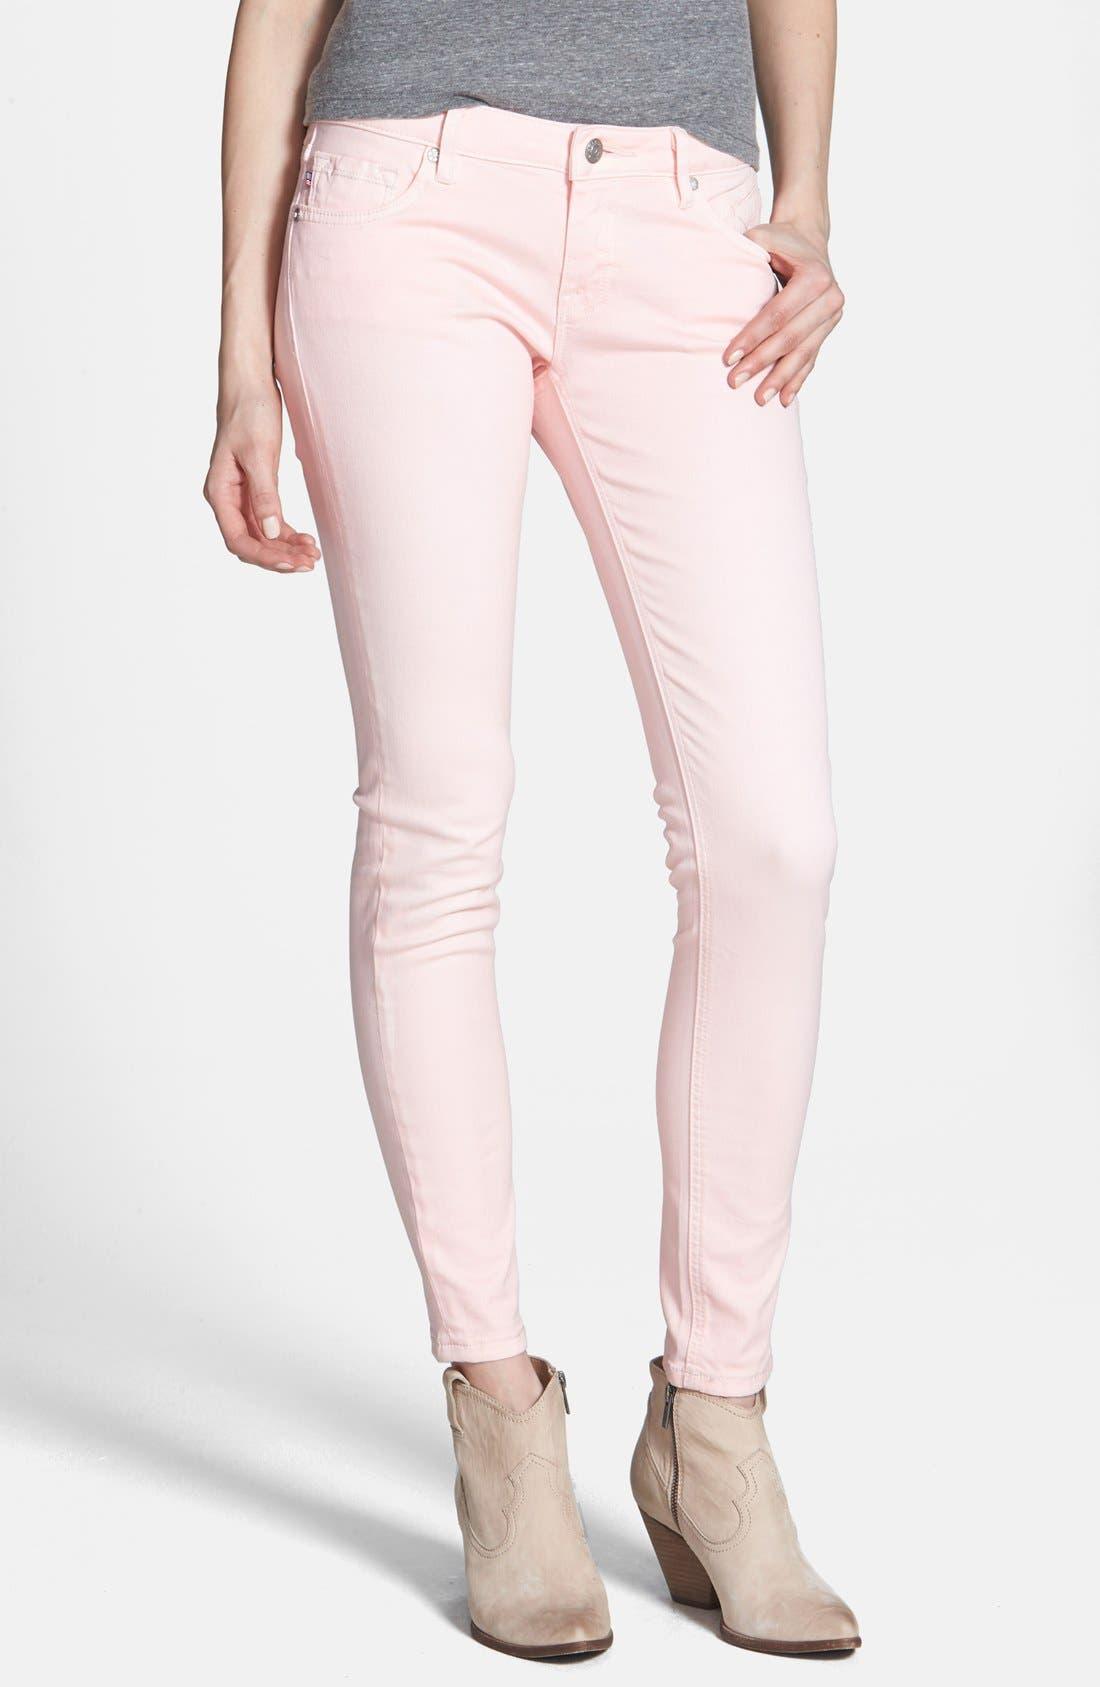 Alternate Image 1 Selected - Vigoss Skinny Ankle Jeans (Light Pink) (Juniors) (Online Only)